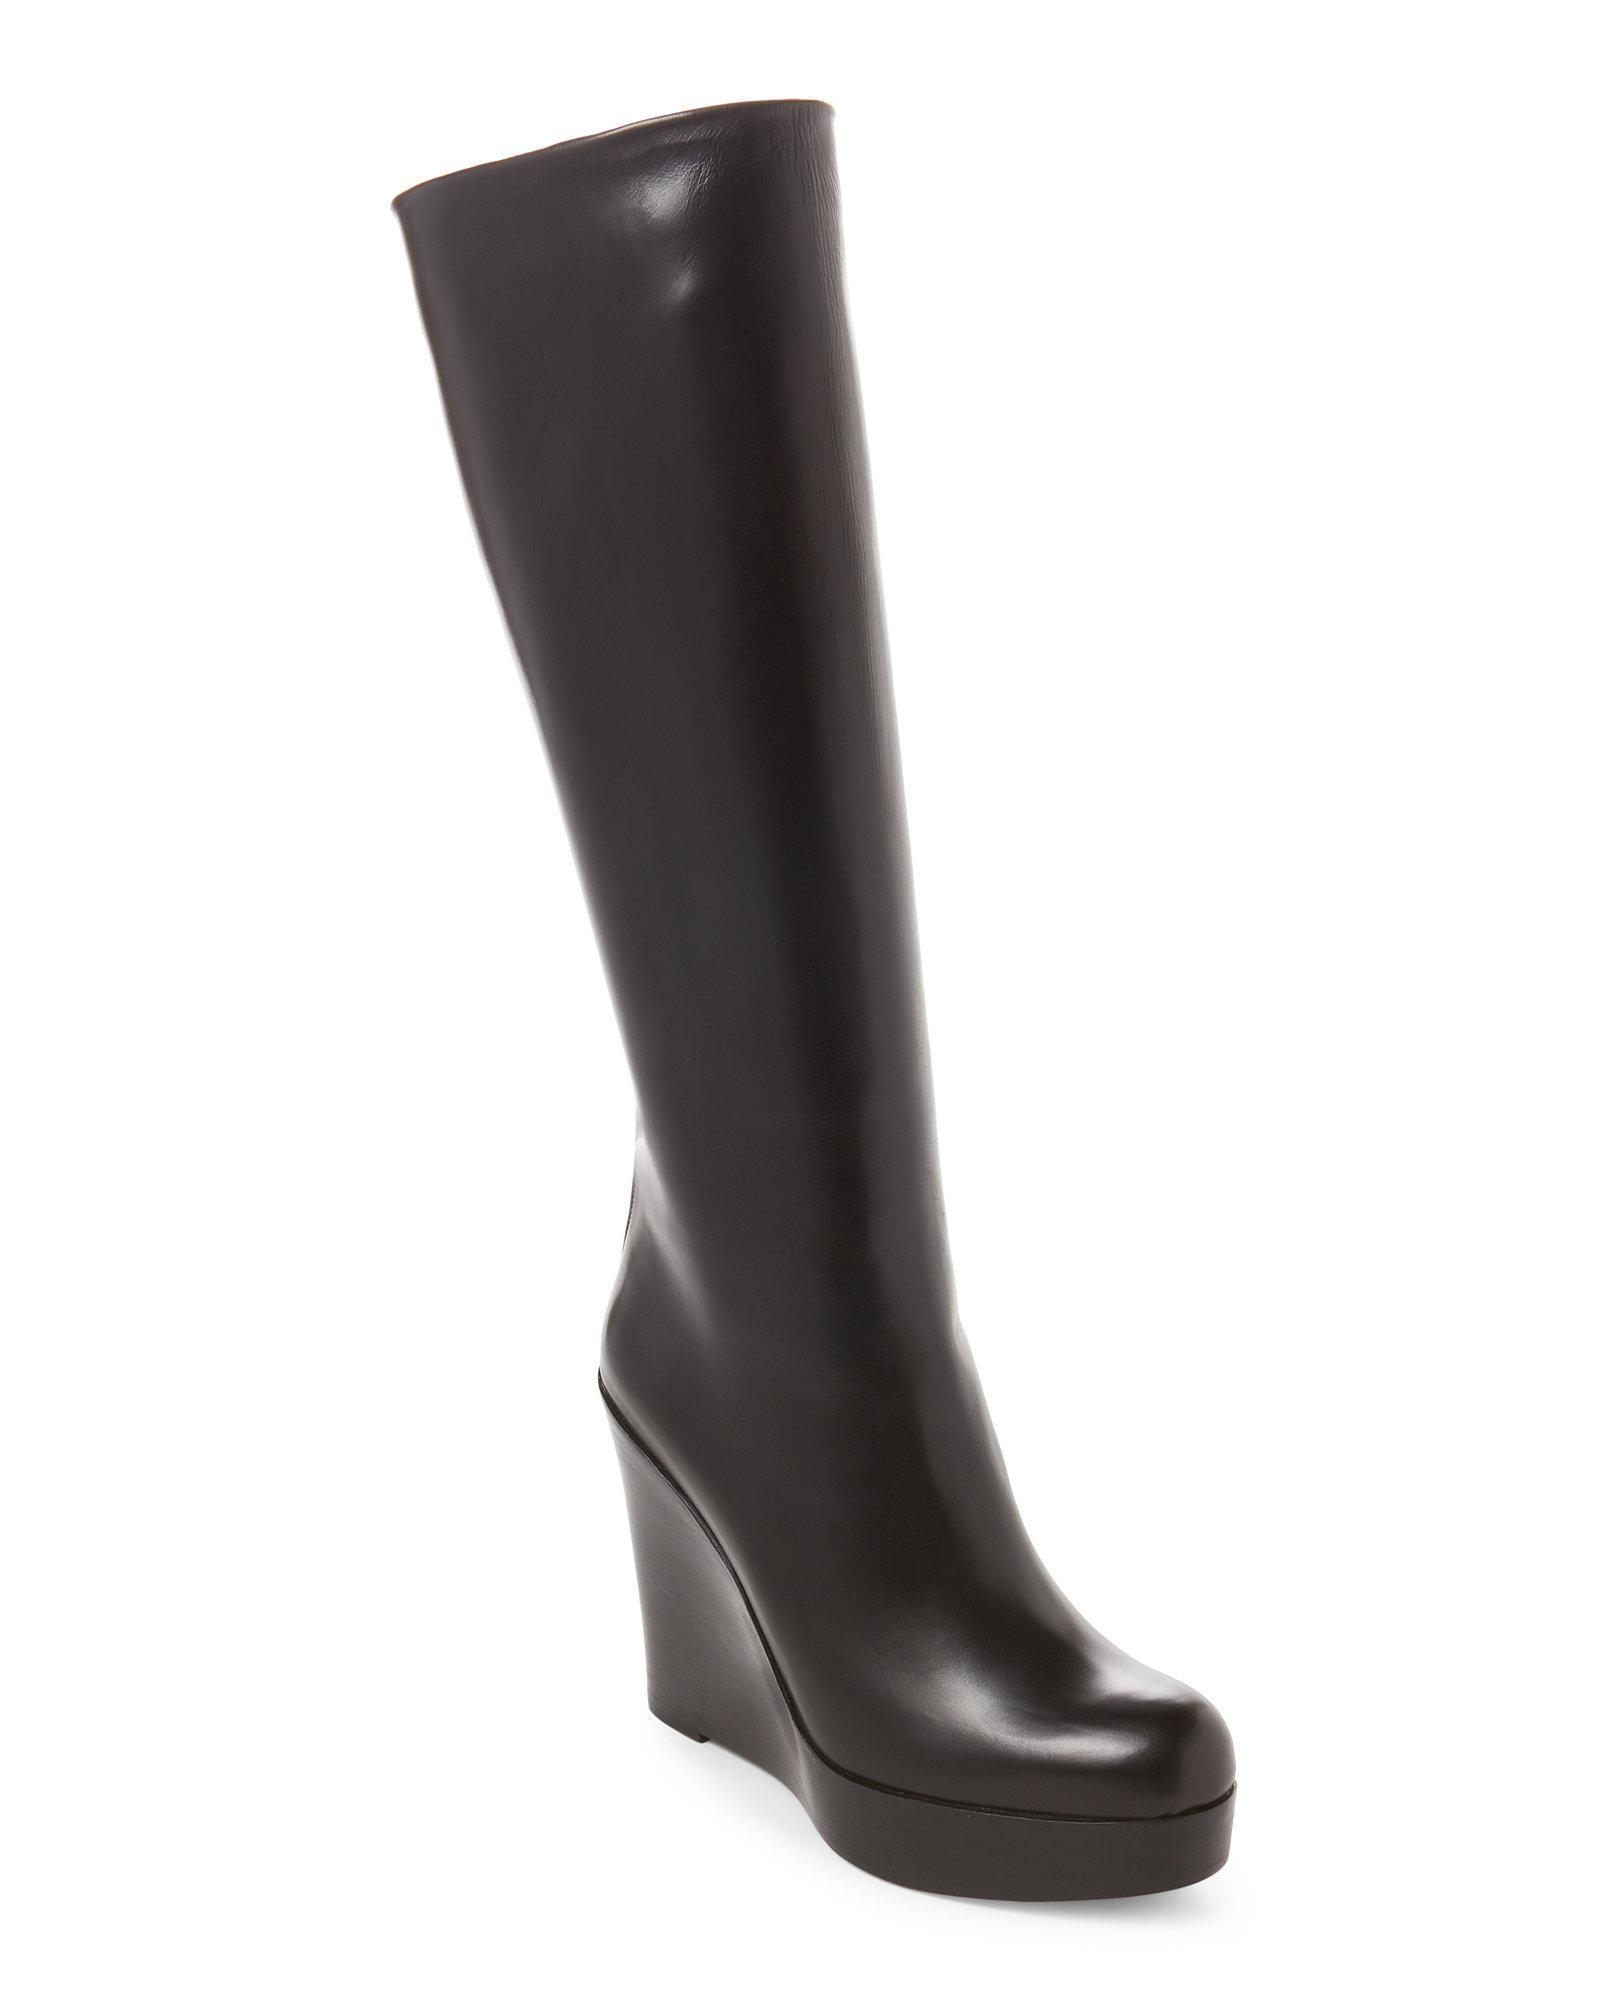 9394e2ef1eb Lyst - Christian Louboutin Black Garibaldi Platform Wedge Boots in Black